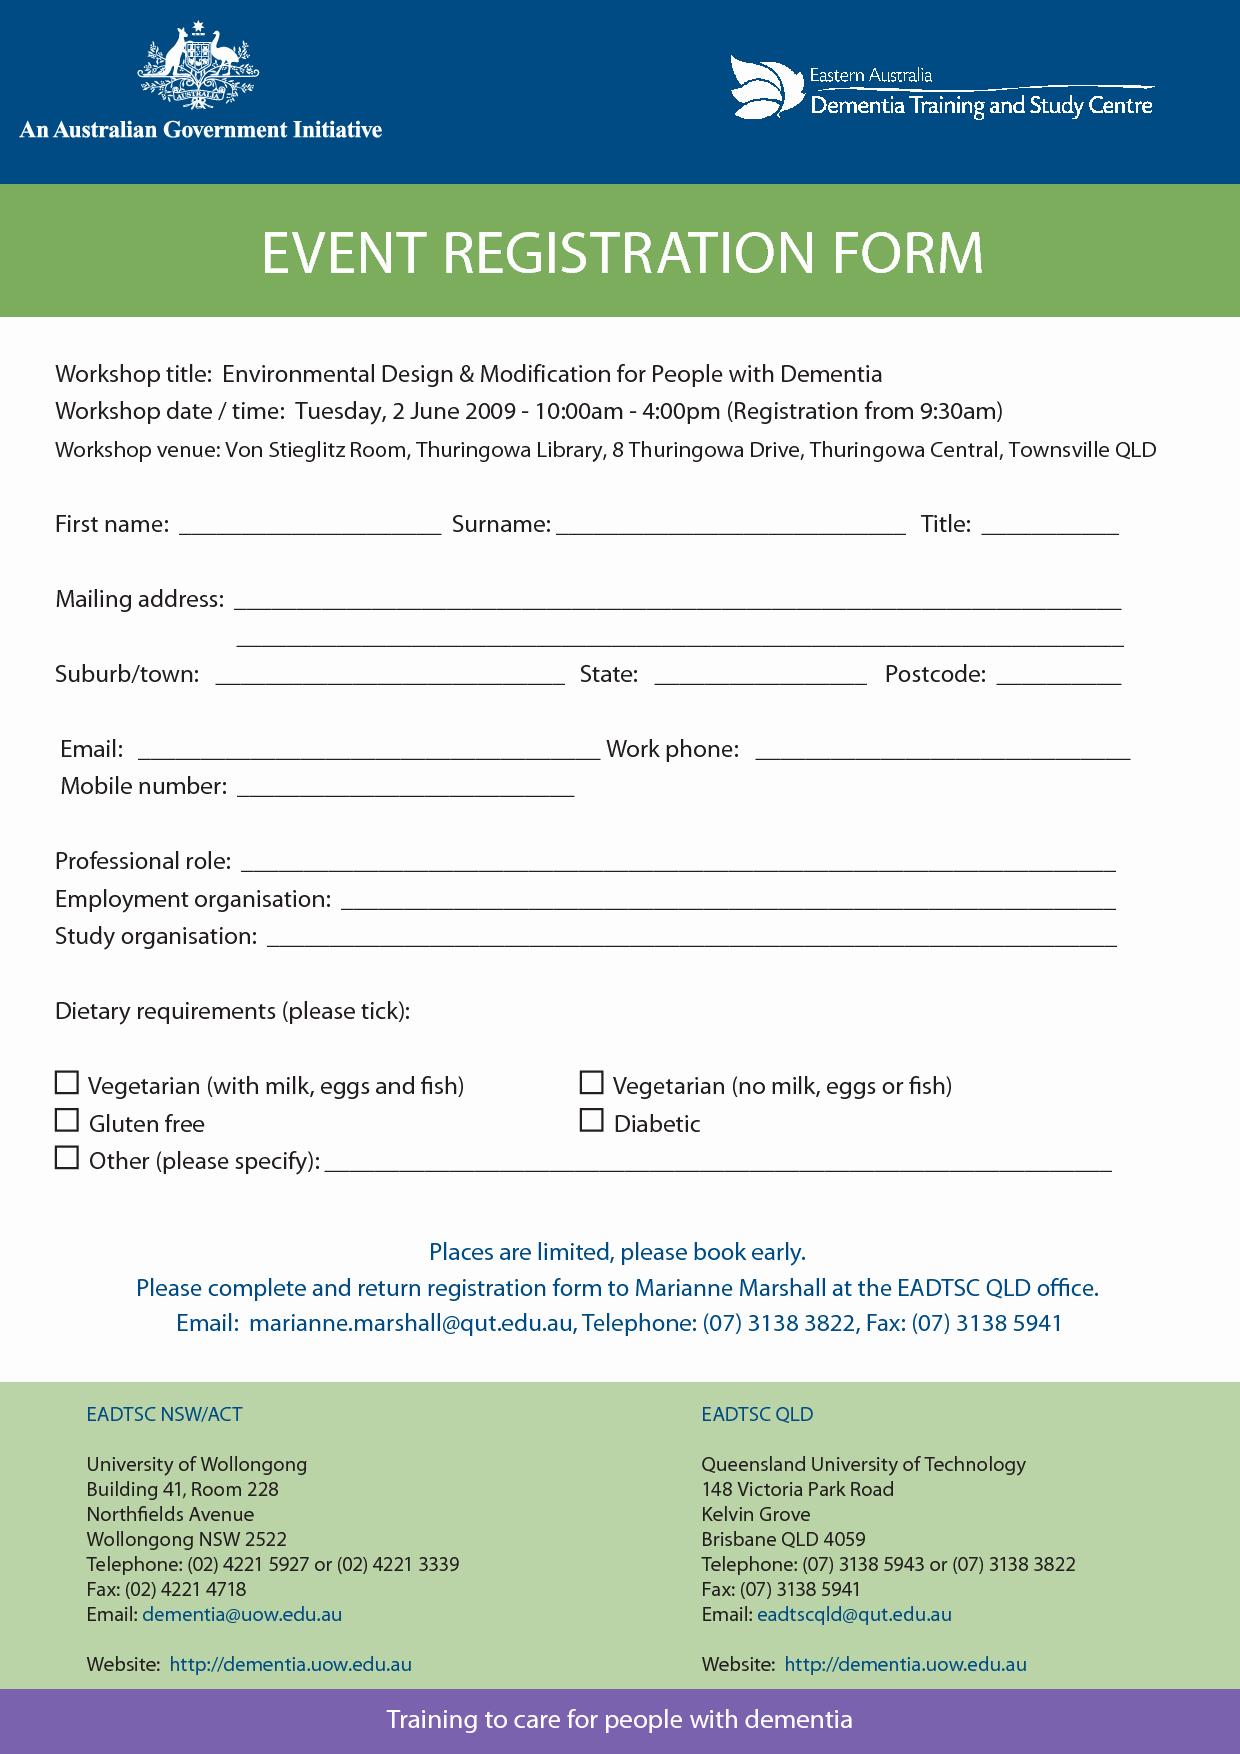 Registration form Template Microsoft Word Inspirational Registration form Template